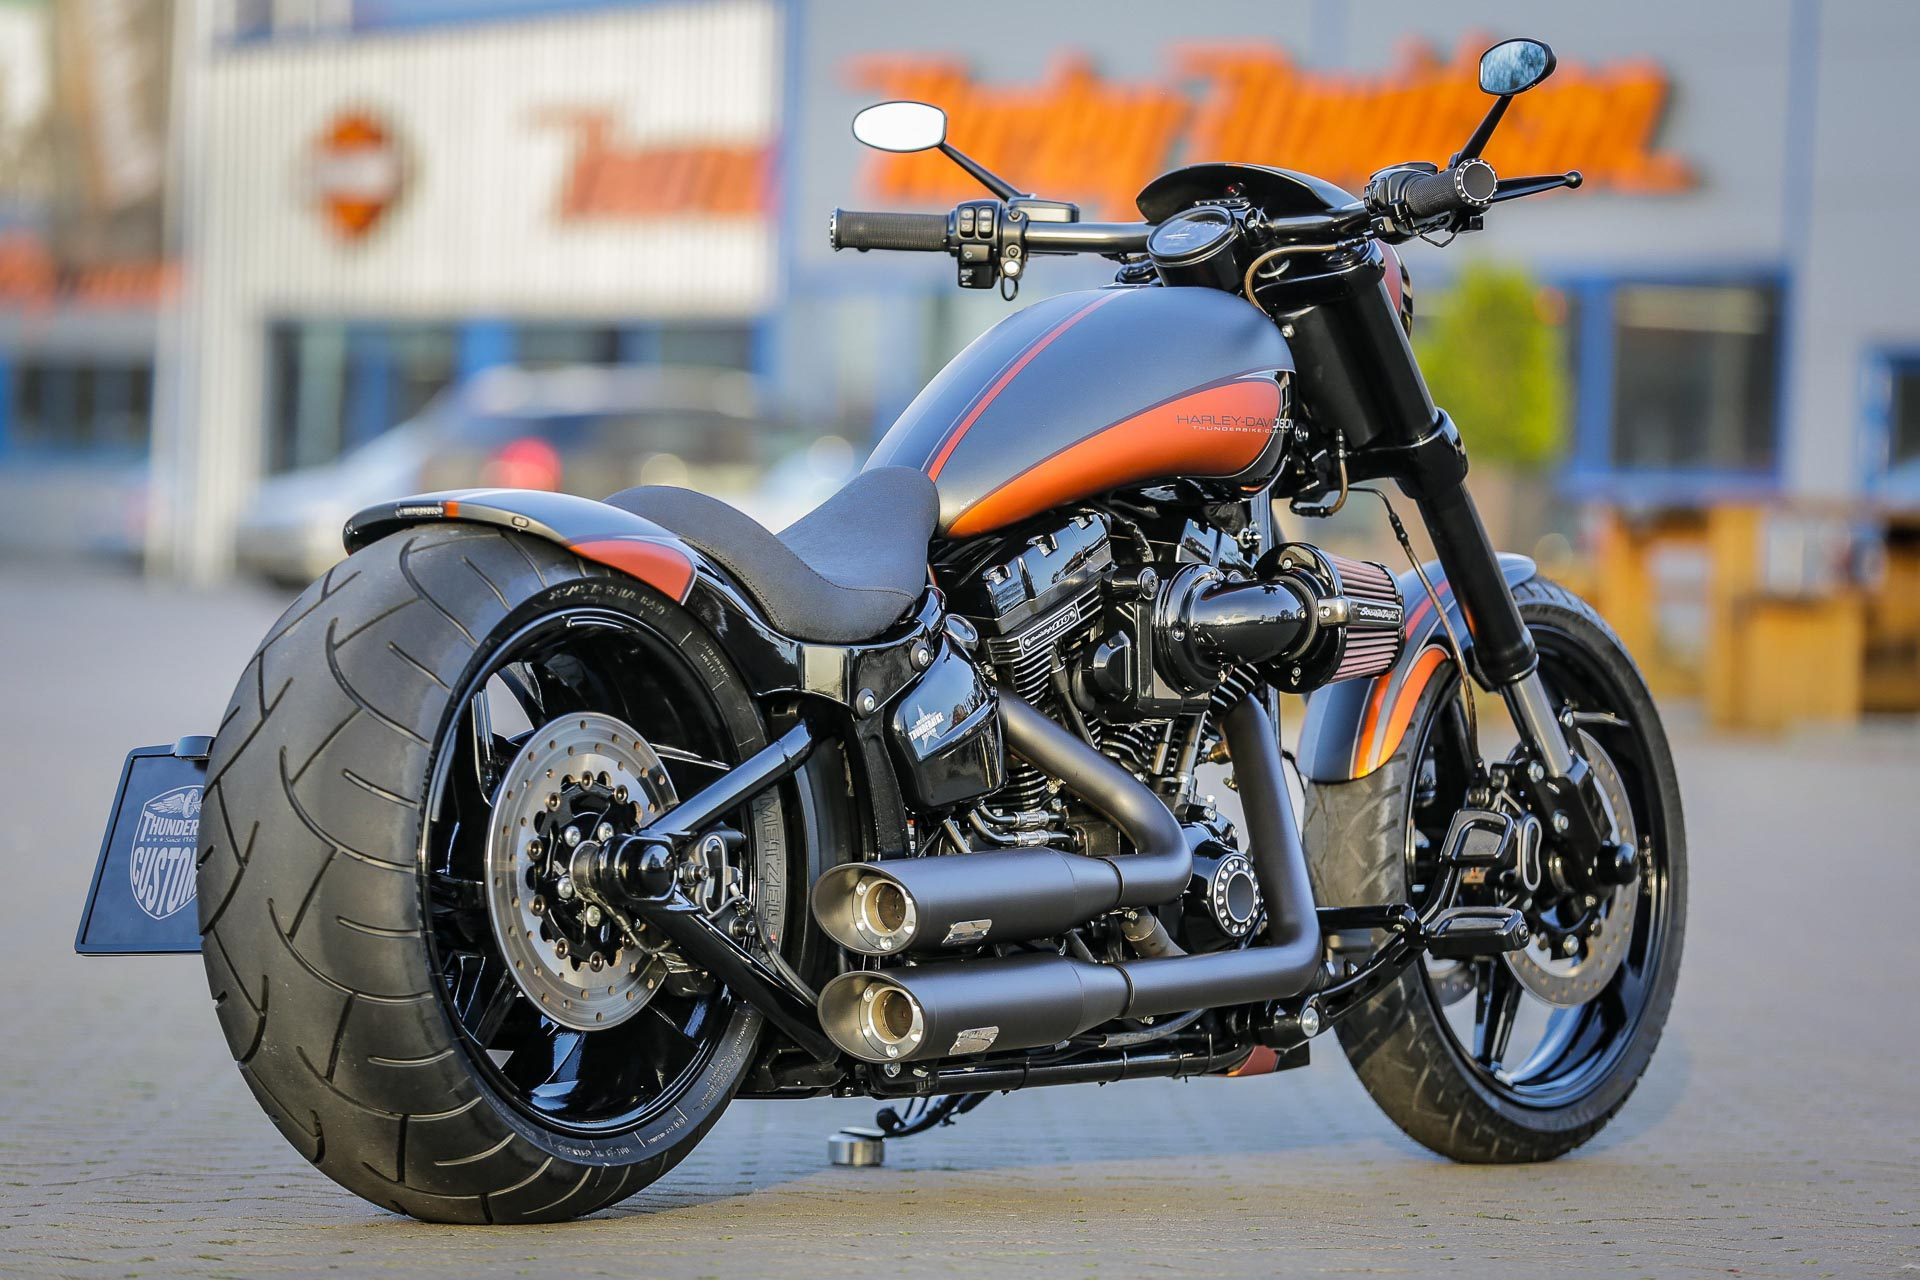 thunderbike sunset h d fxse breakout cvo custom motorcycle. Black Bedroom Furniture Sets. Home Design Ideas